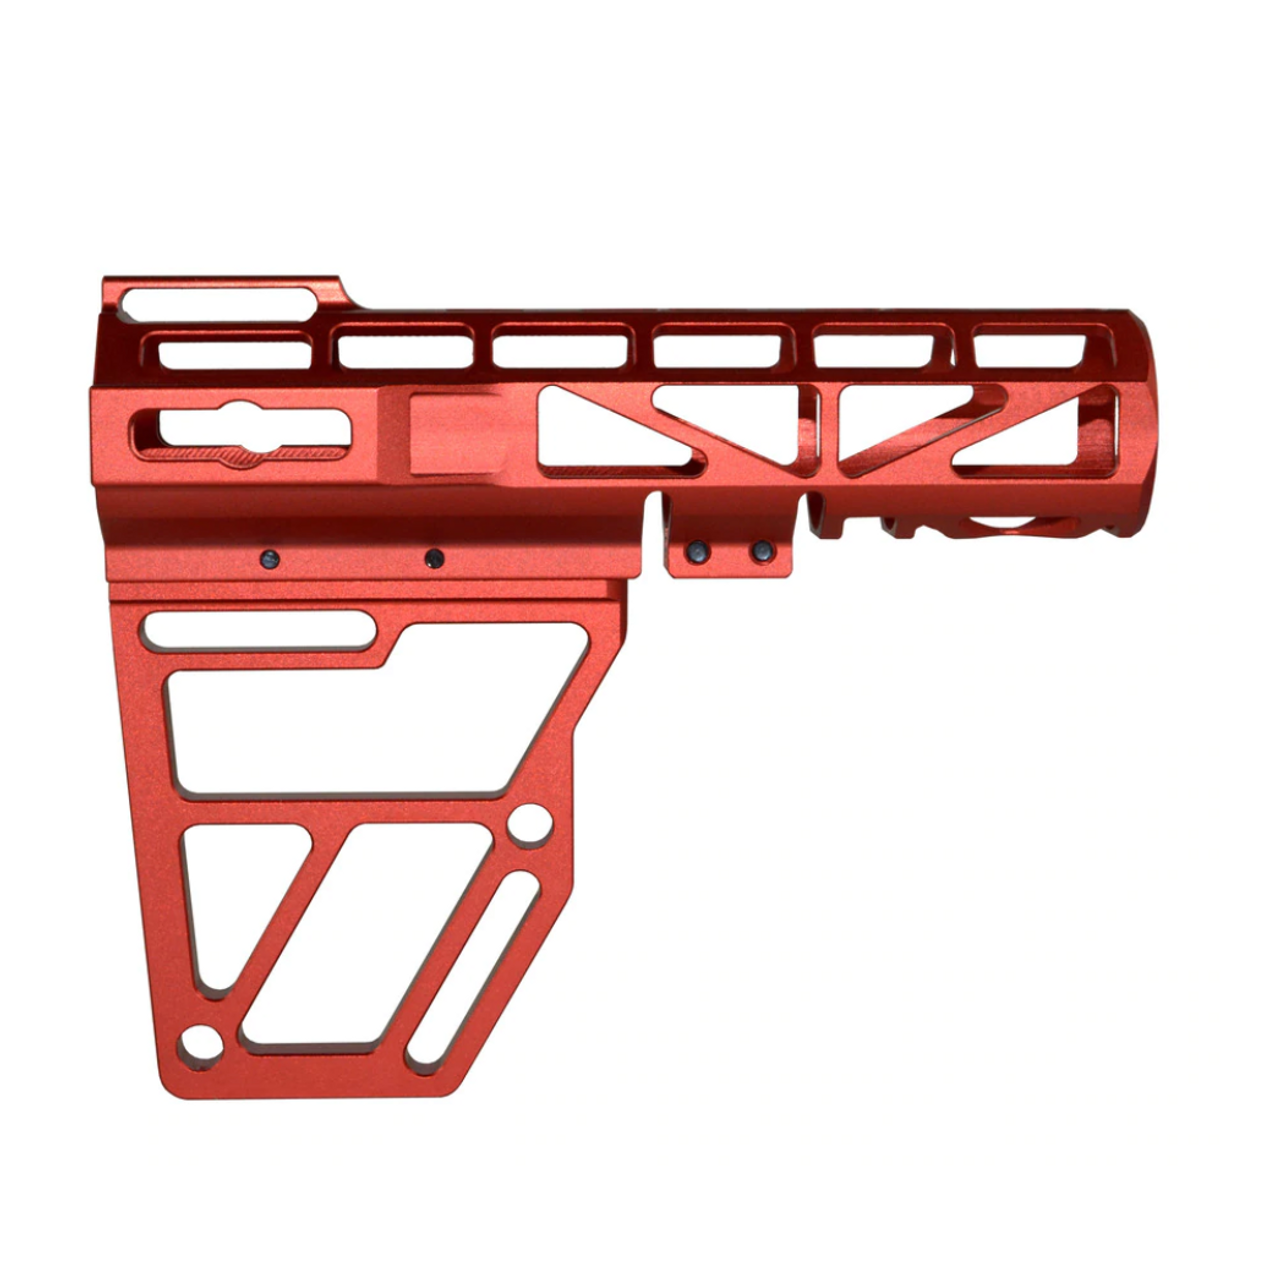 Skeletonized Pistol Arm Brace, Red Anodized Aluminum.